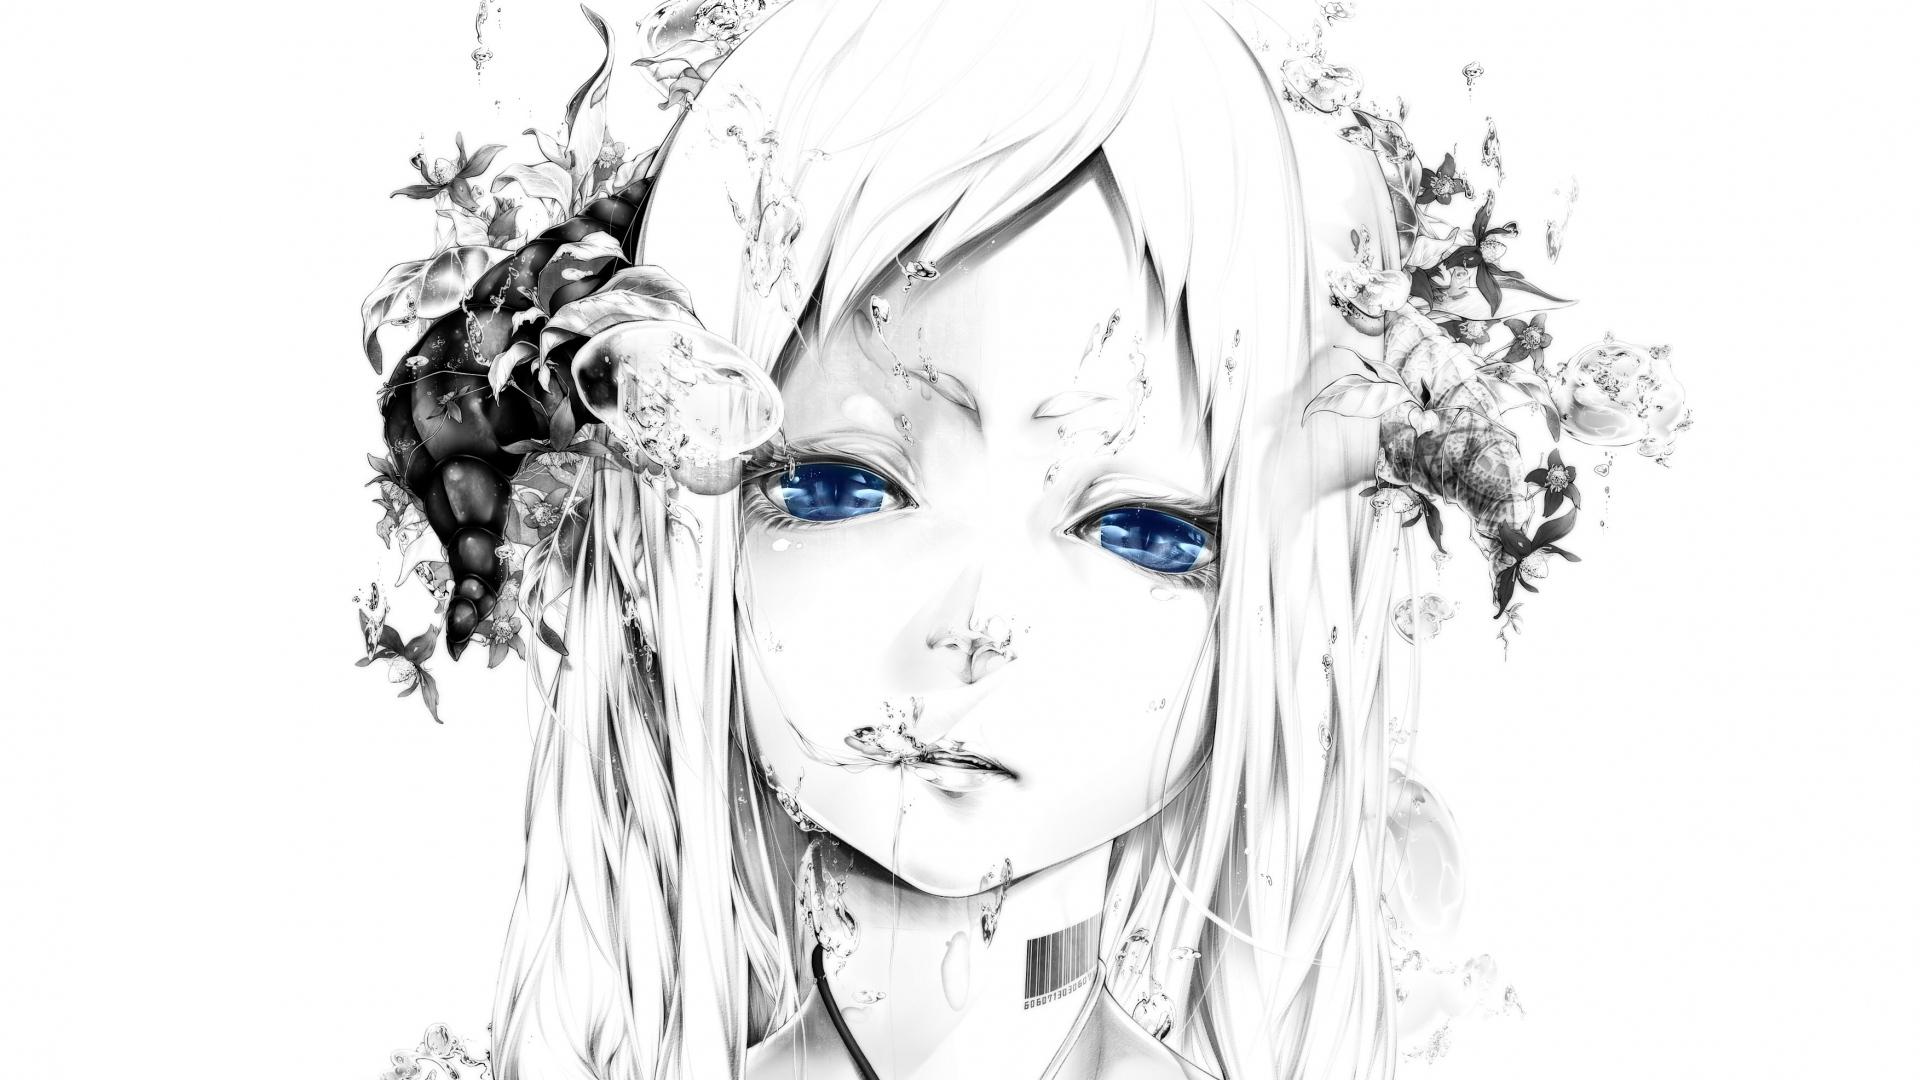 1920x1080-art-bouno-satoshi-girl-face-white-background-graphic-monochrome-blue-eyes-wallpaper-wp380899